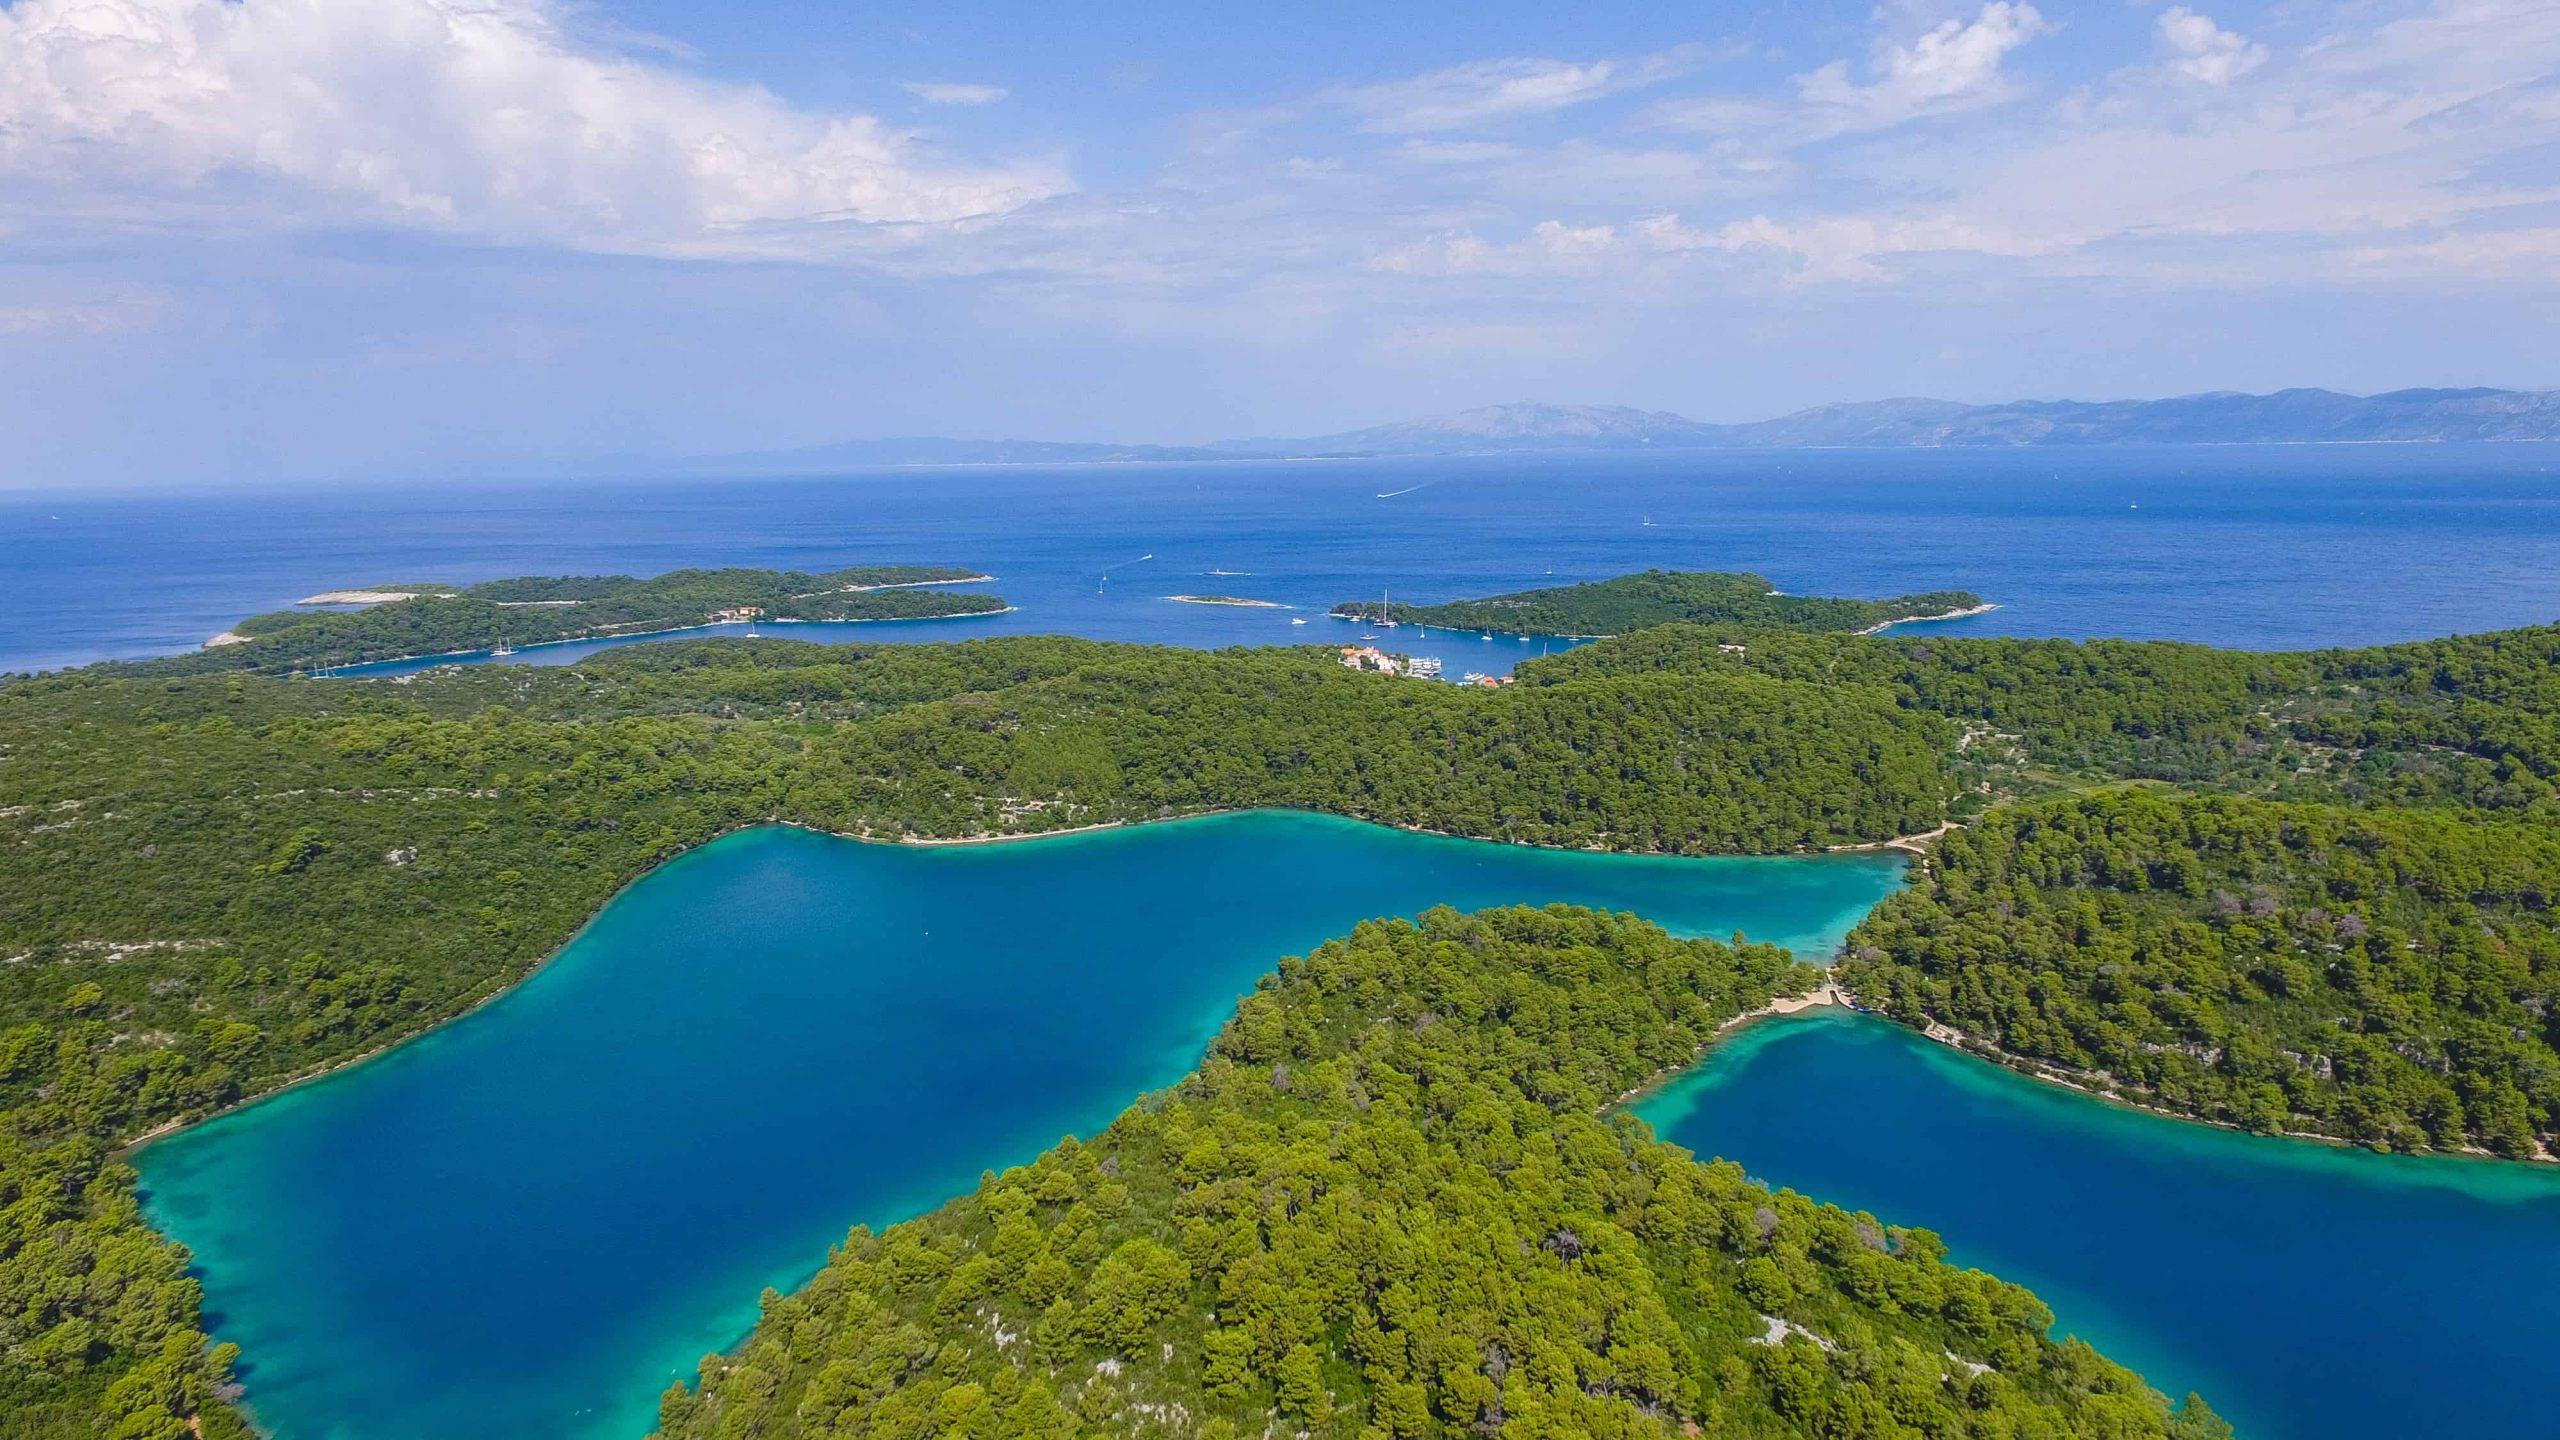 mljet_island_cruise_port_croatia